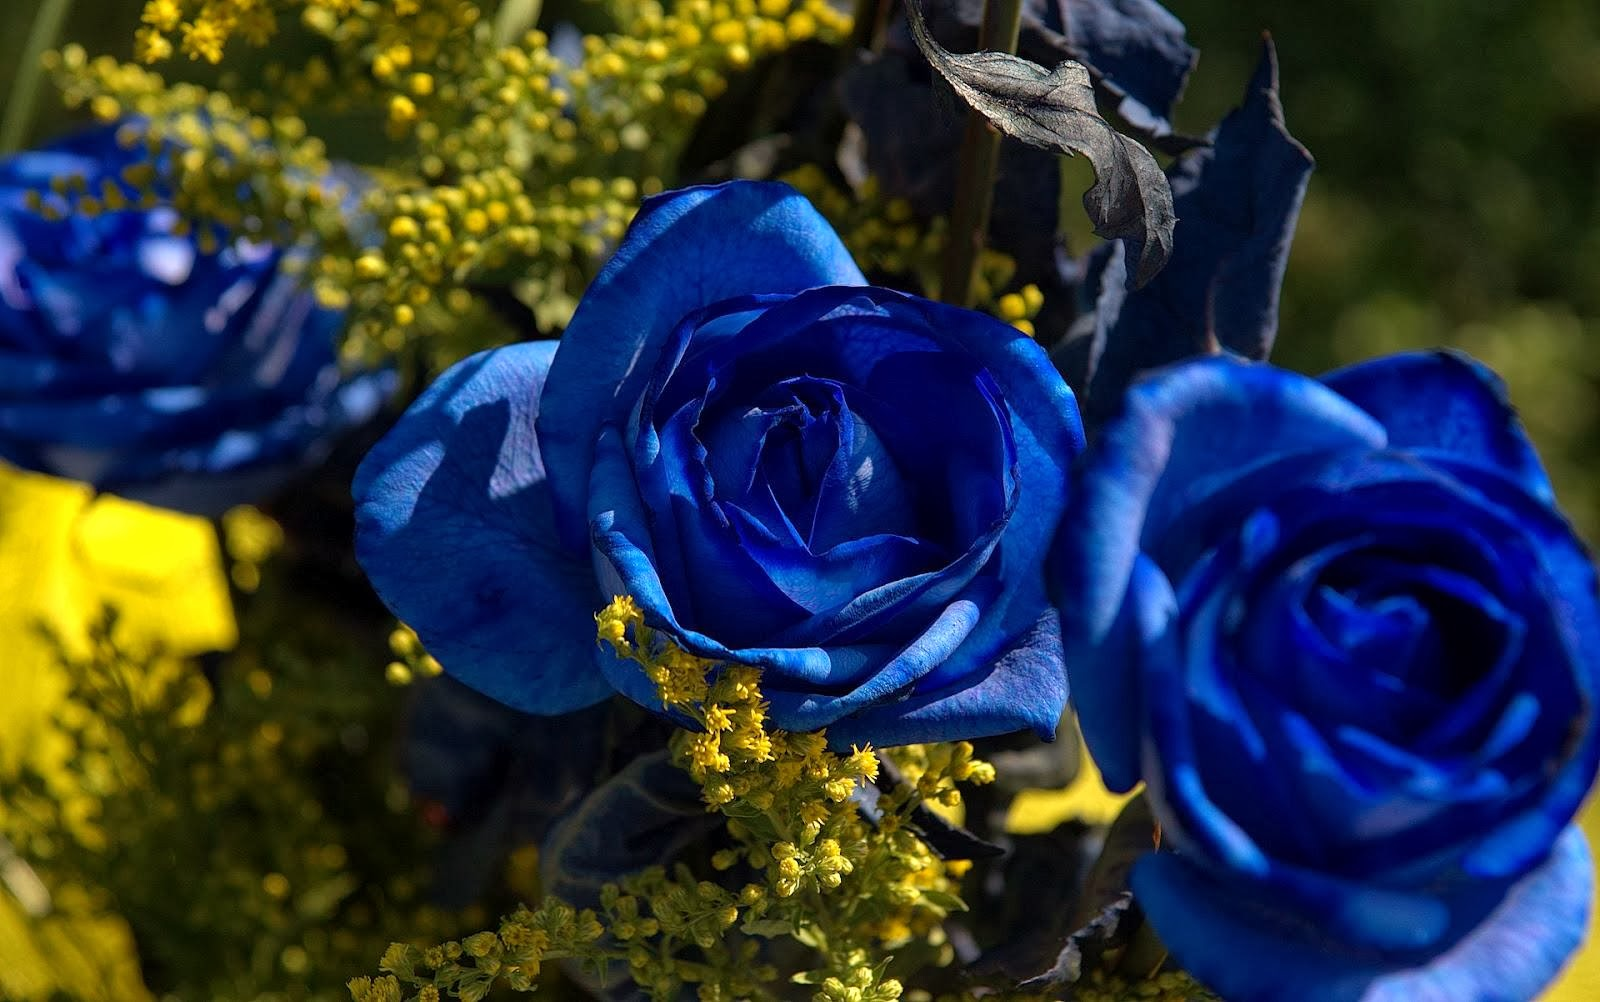 blue rose wallpaper background beautiful desktop